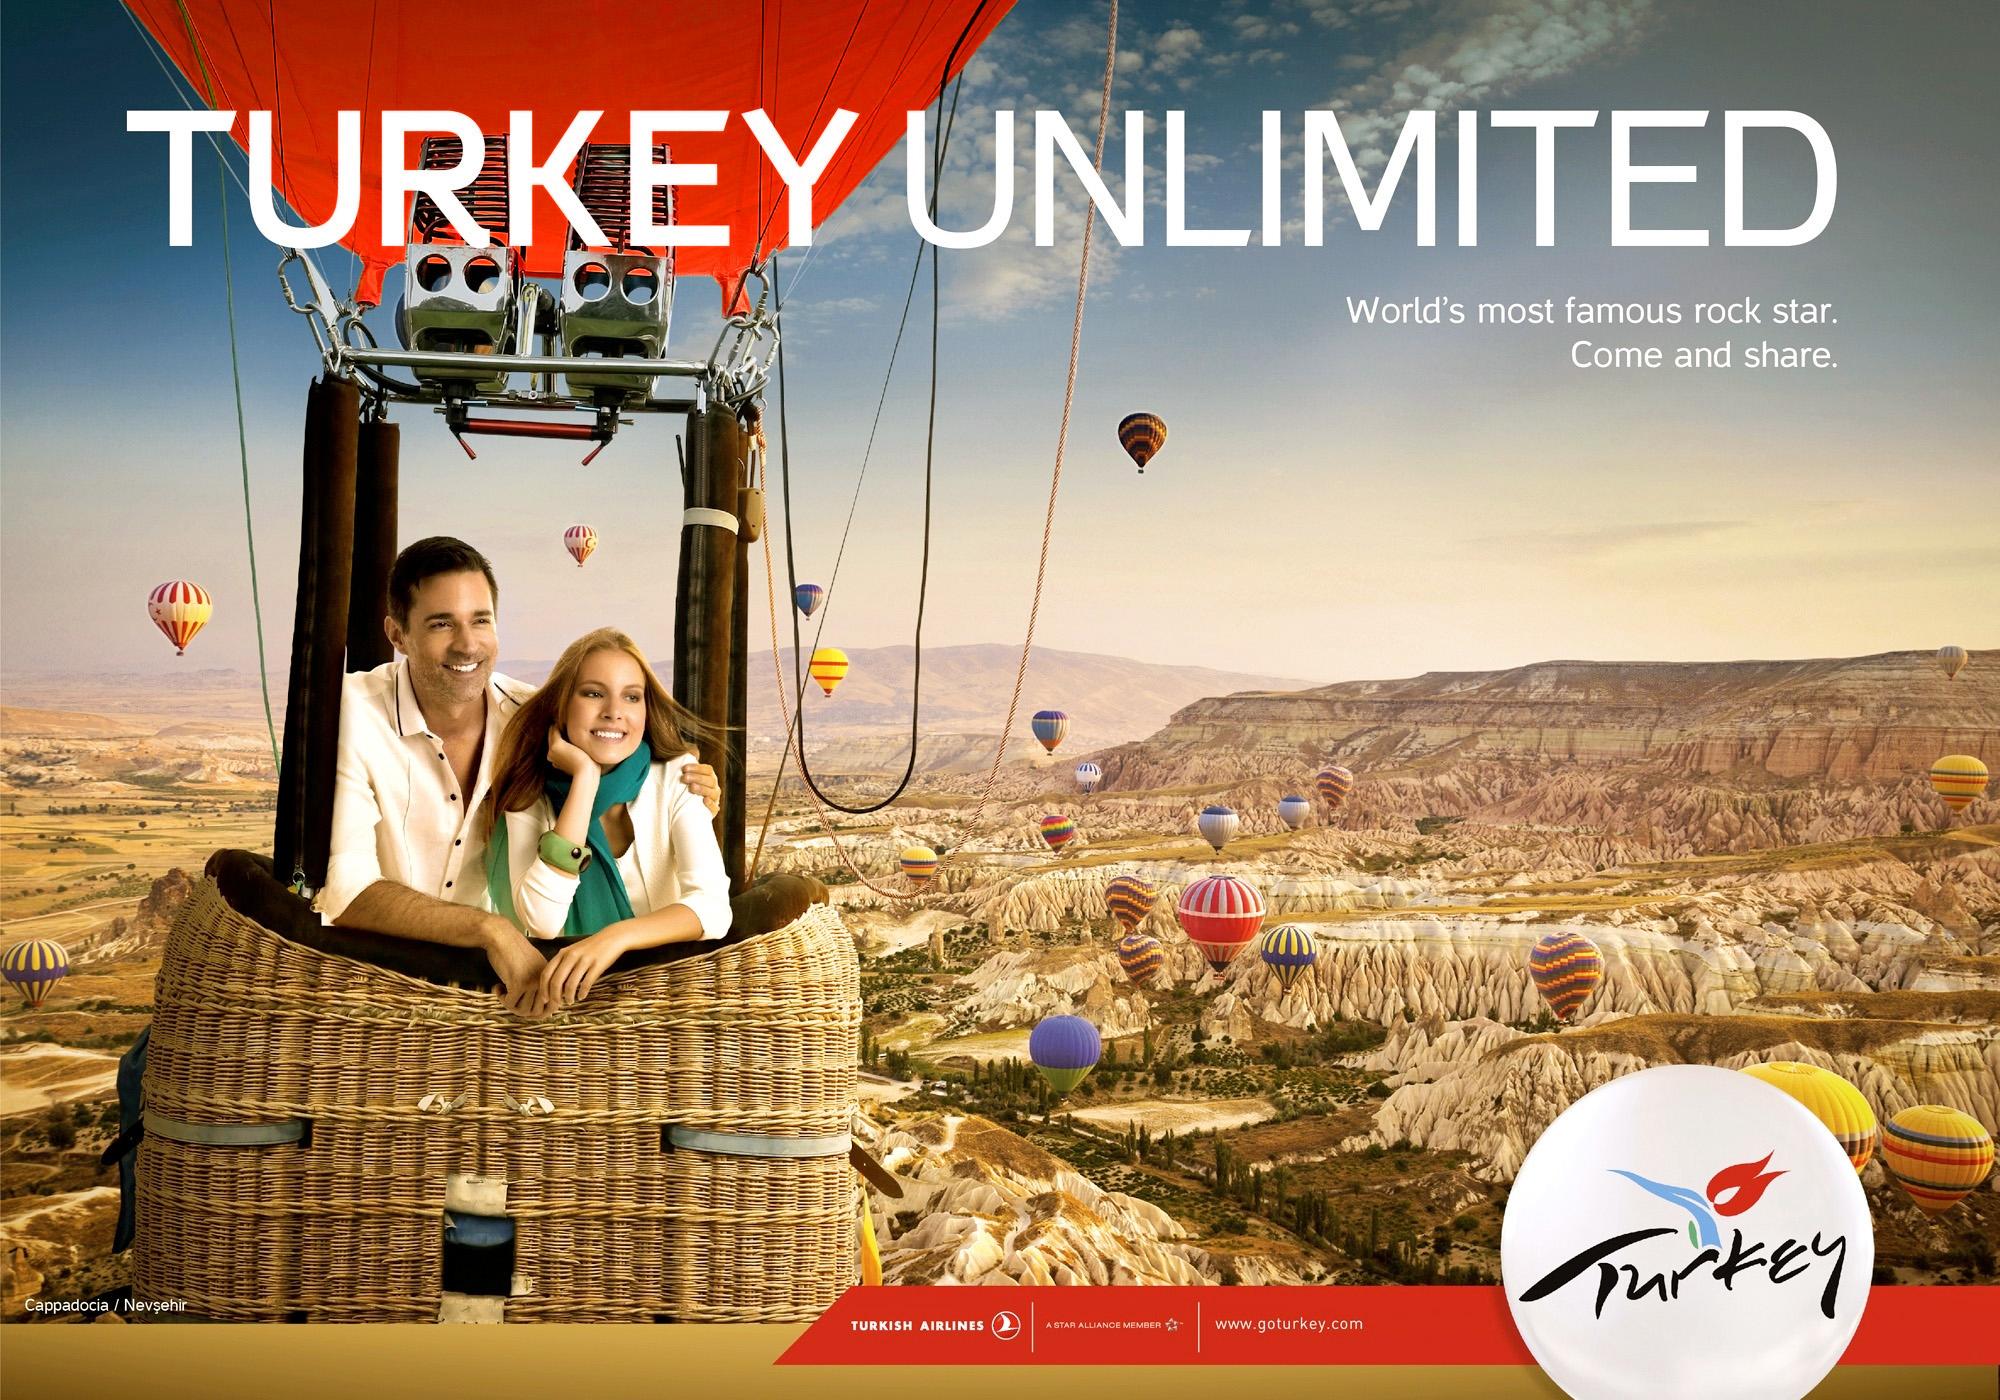 Turkey_2013_8